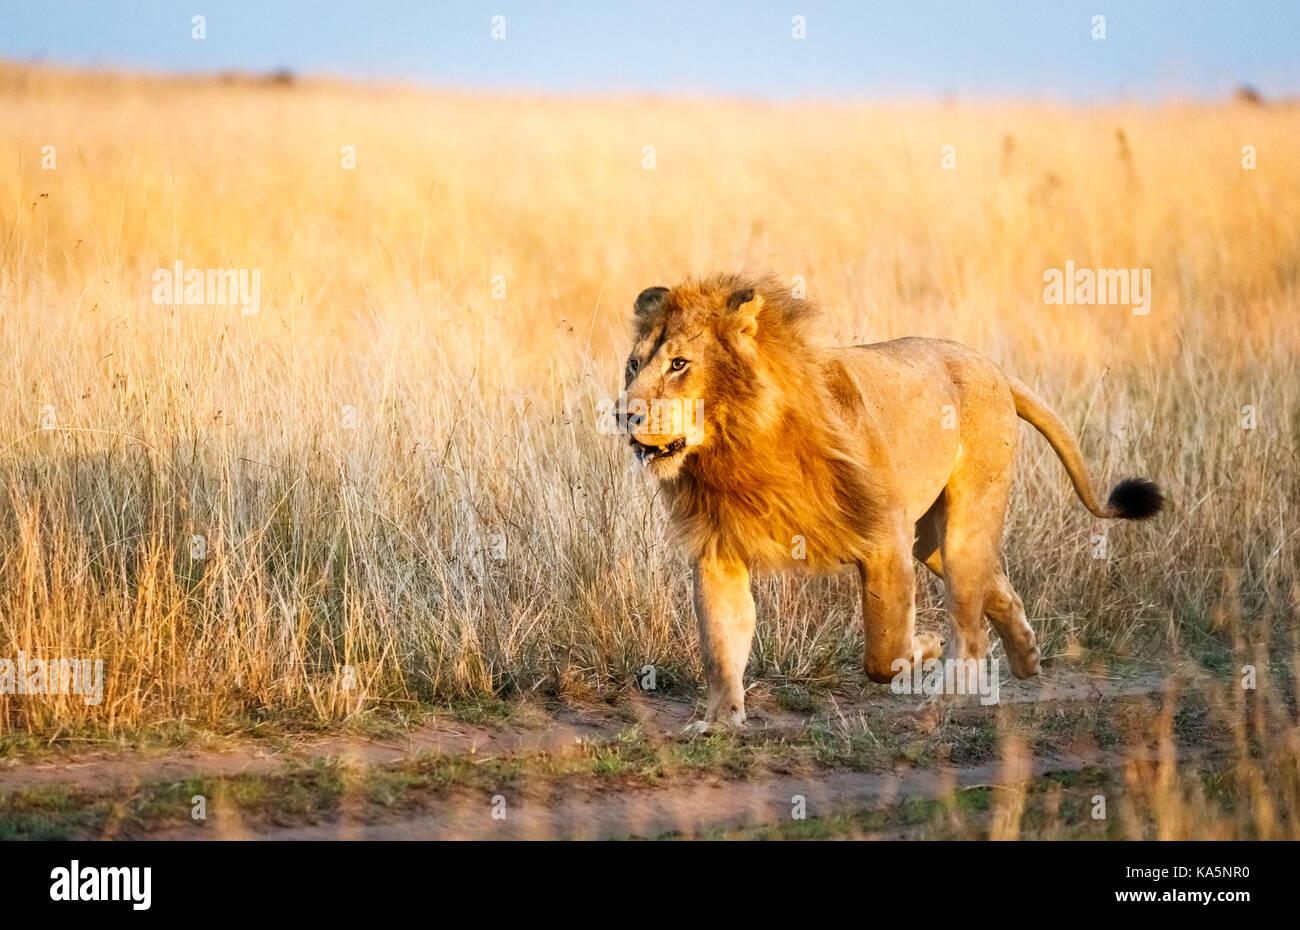 Merodea macho adulto Mara León (Panthera leo) se rompe en una carrera para enfrentarse a un rival en el césped Imagen De Stock